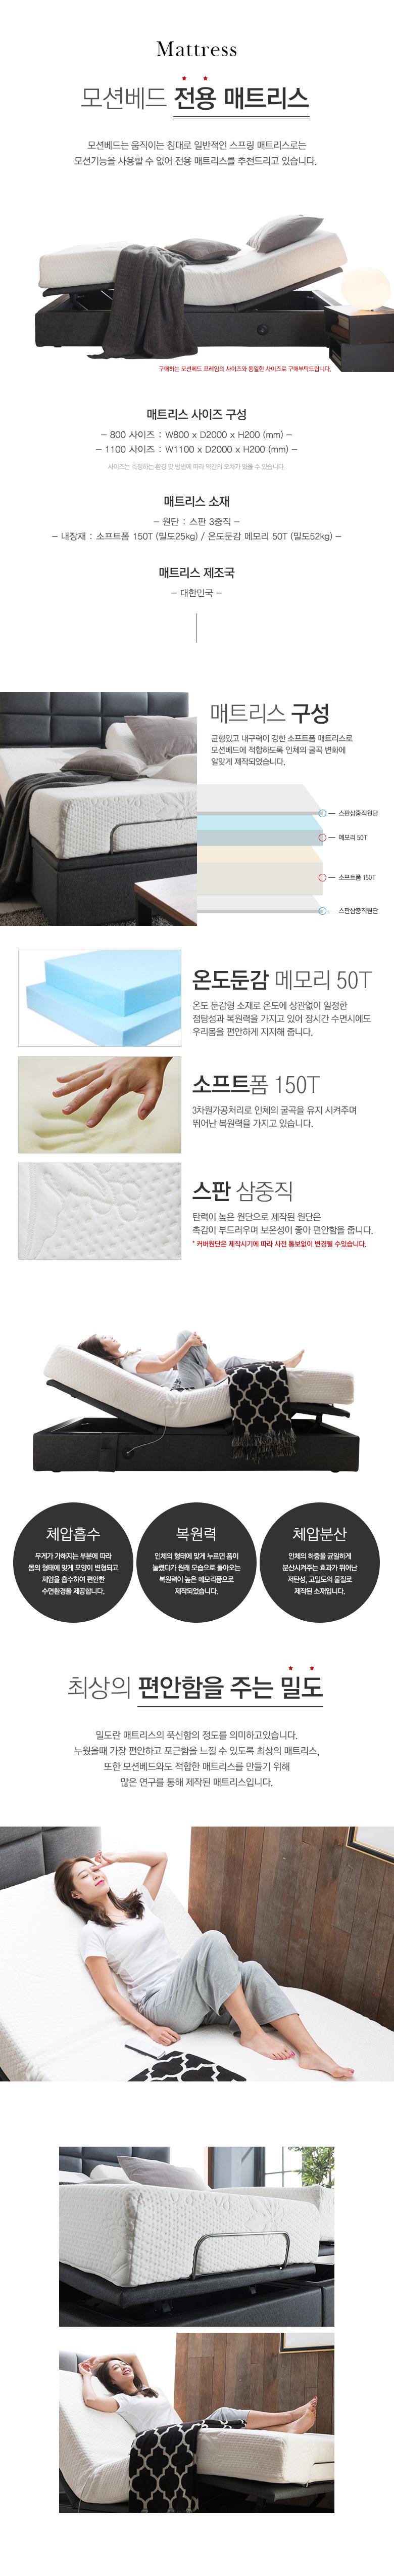 PookShuim푹쉼 넬슨 1100 전동모션베드,매트 - 채우리, 1,932,000원, 침대, 싱글/슈퍼싱글 침대